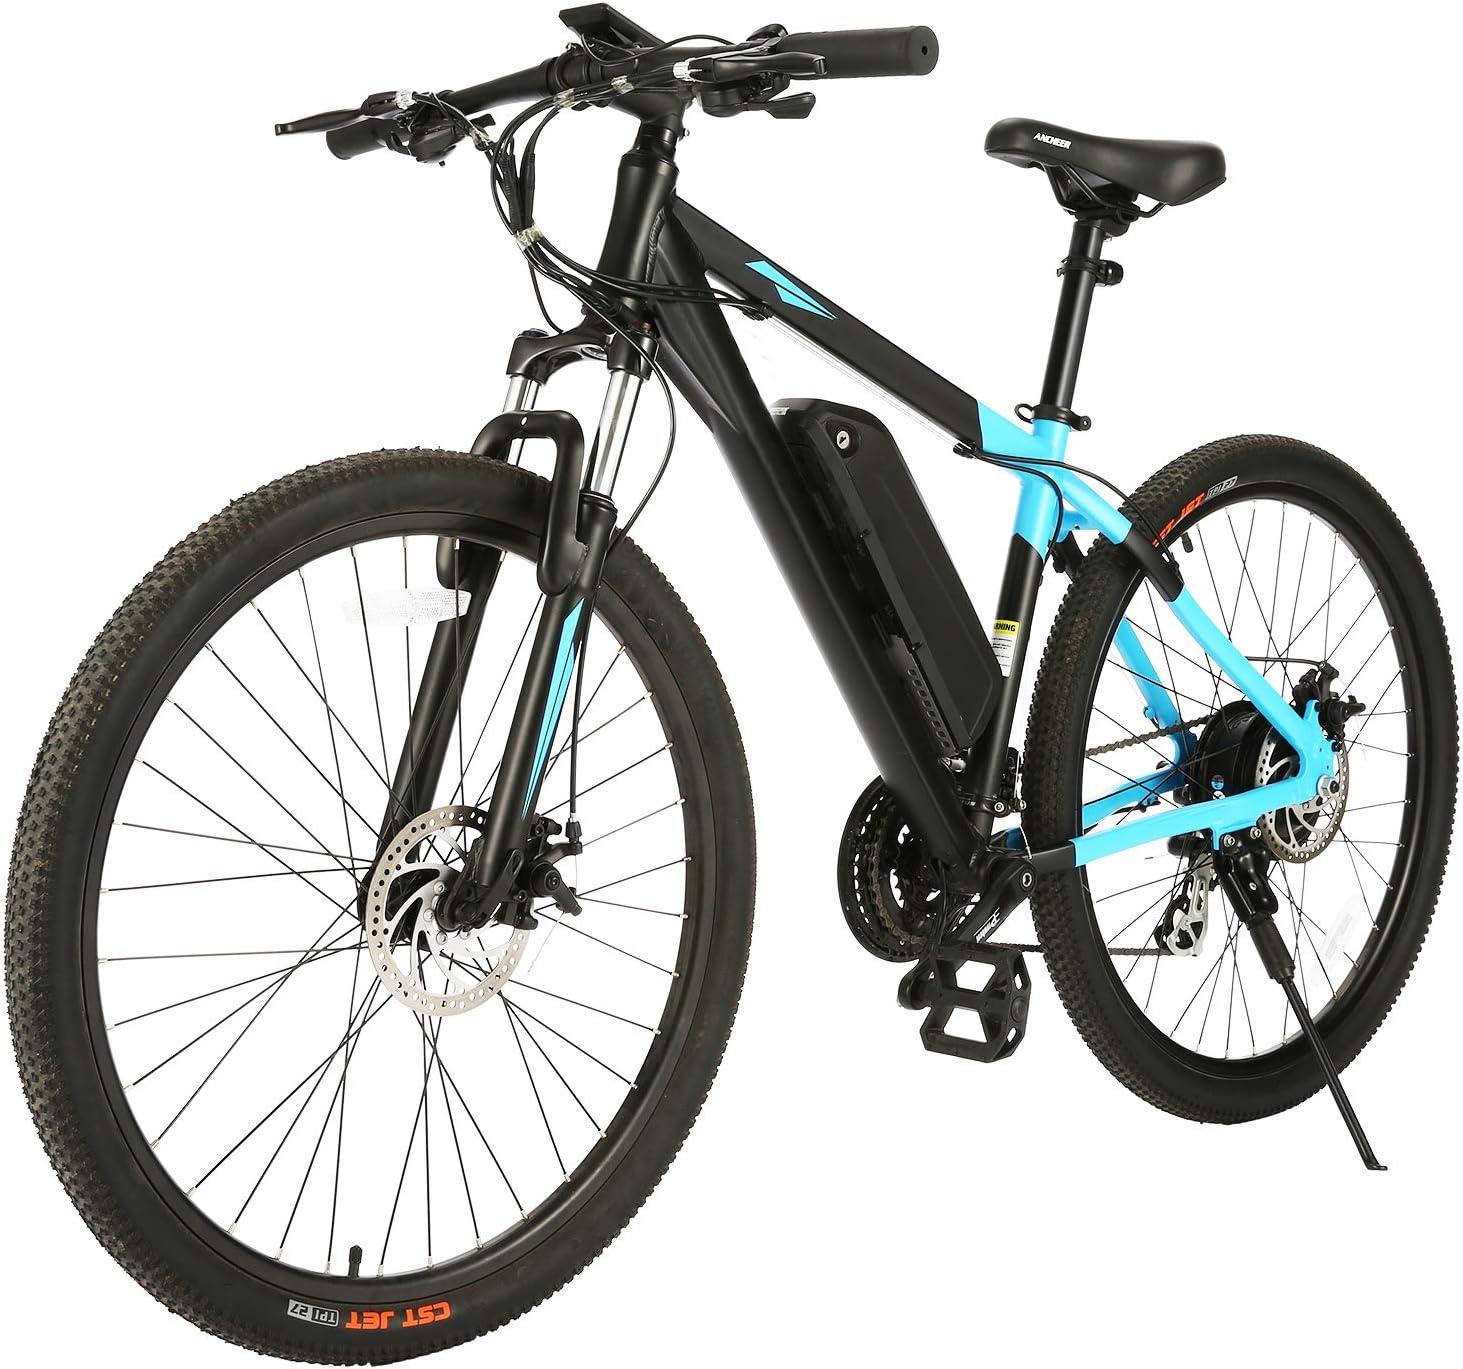 Speedrid e-MTB bicycle